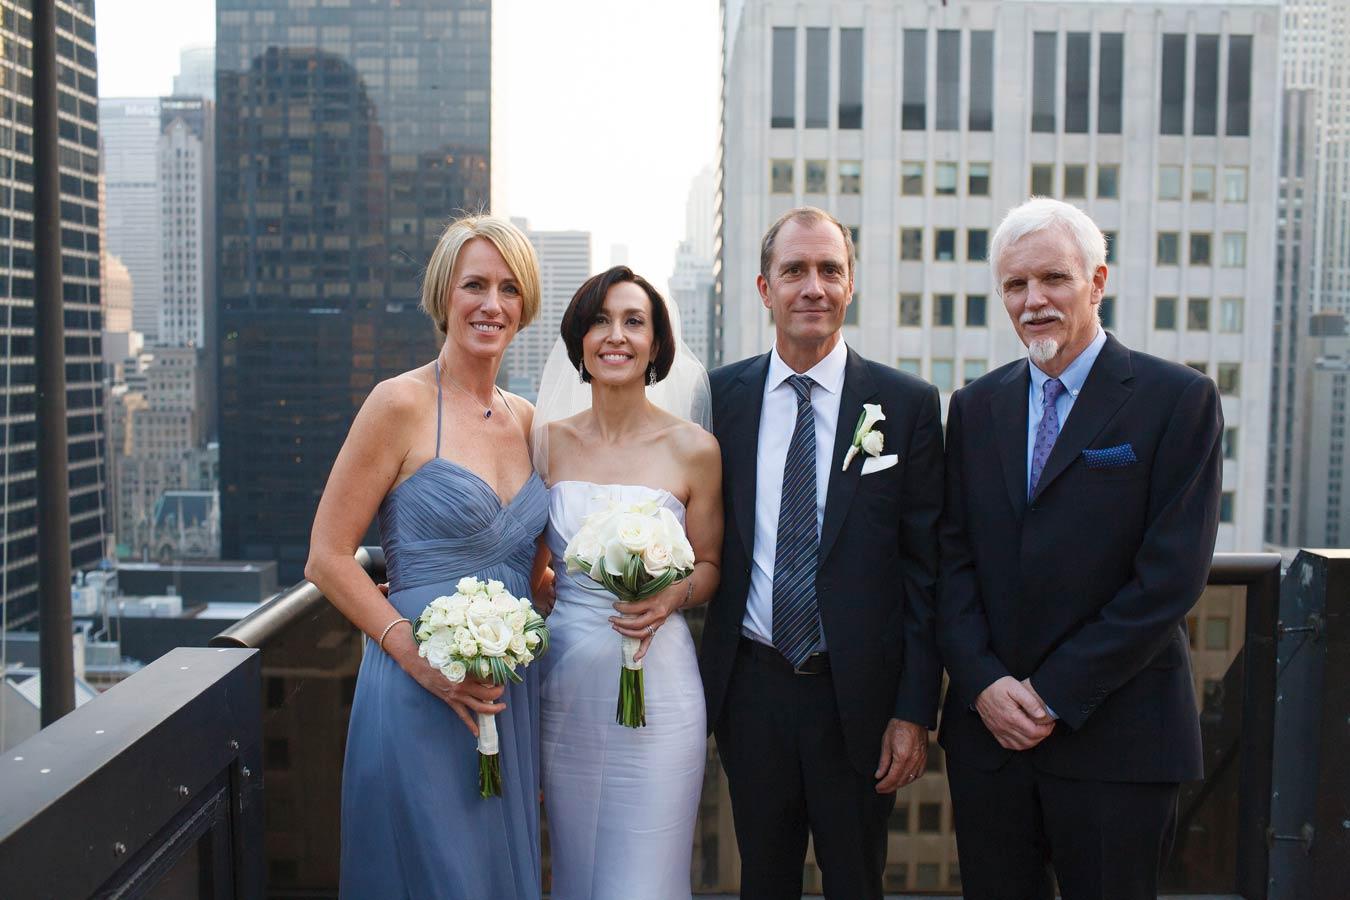 peninsula-hotel-yc-wedding-photographer0079.jpg